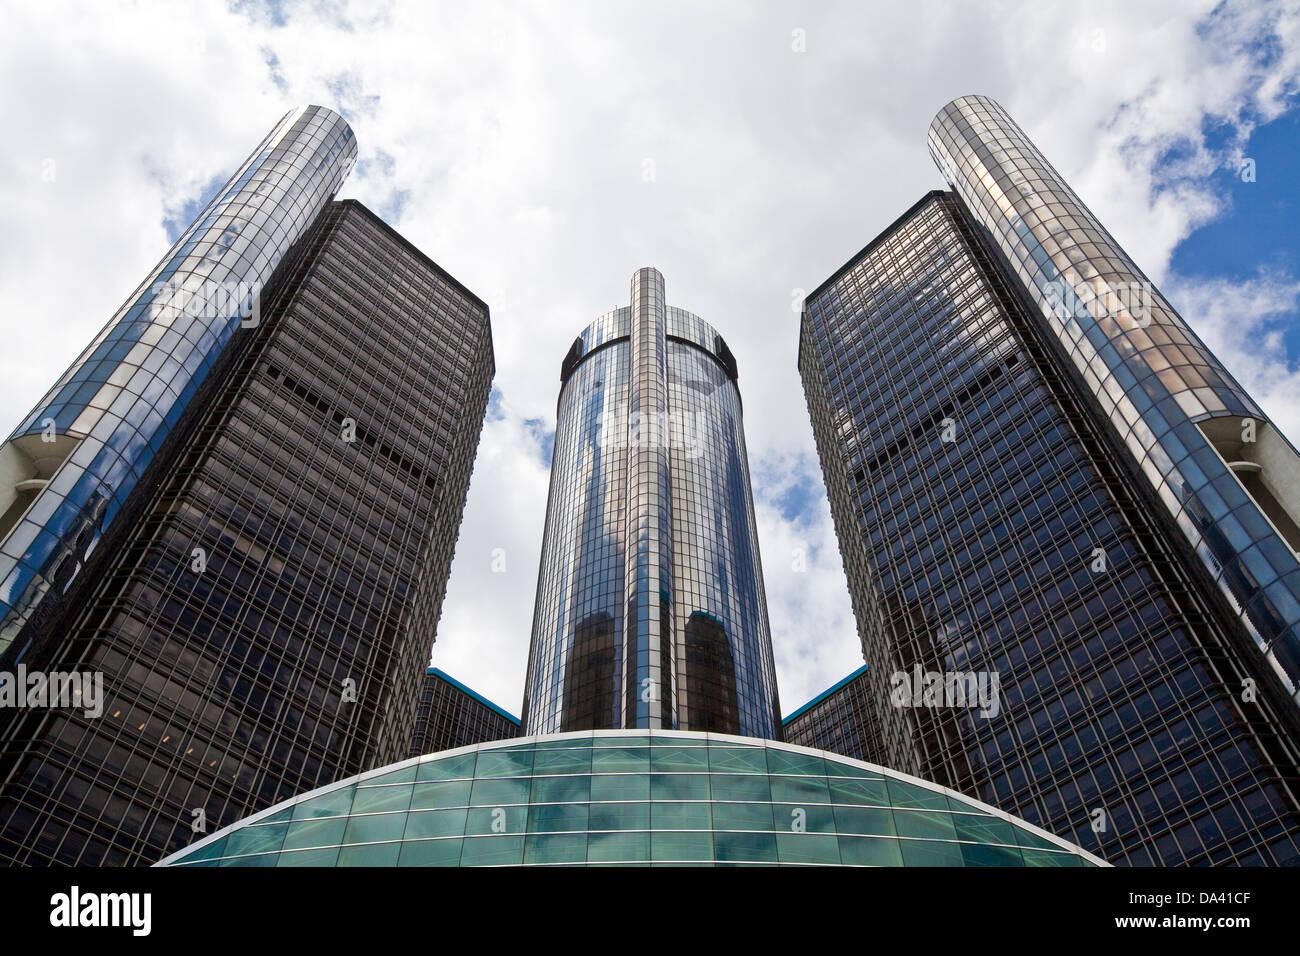 General Motors Corporate Office & Headquarters